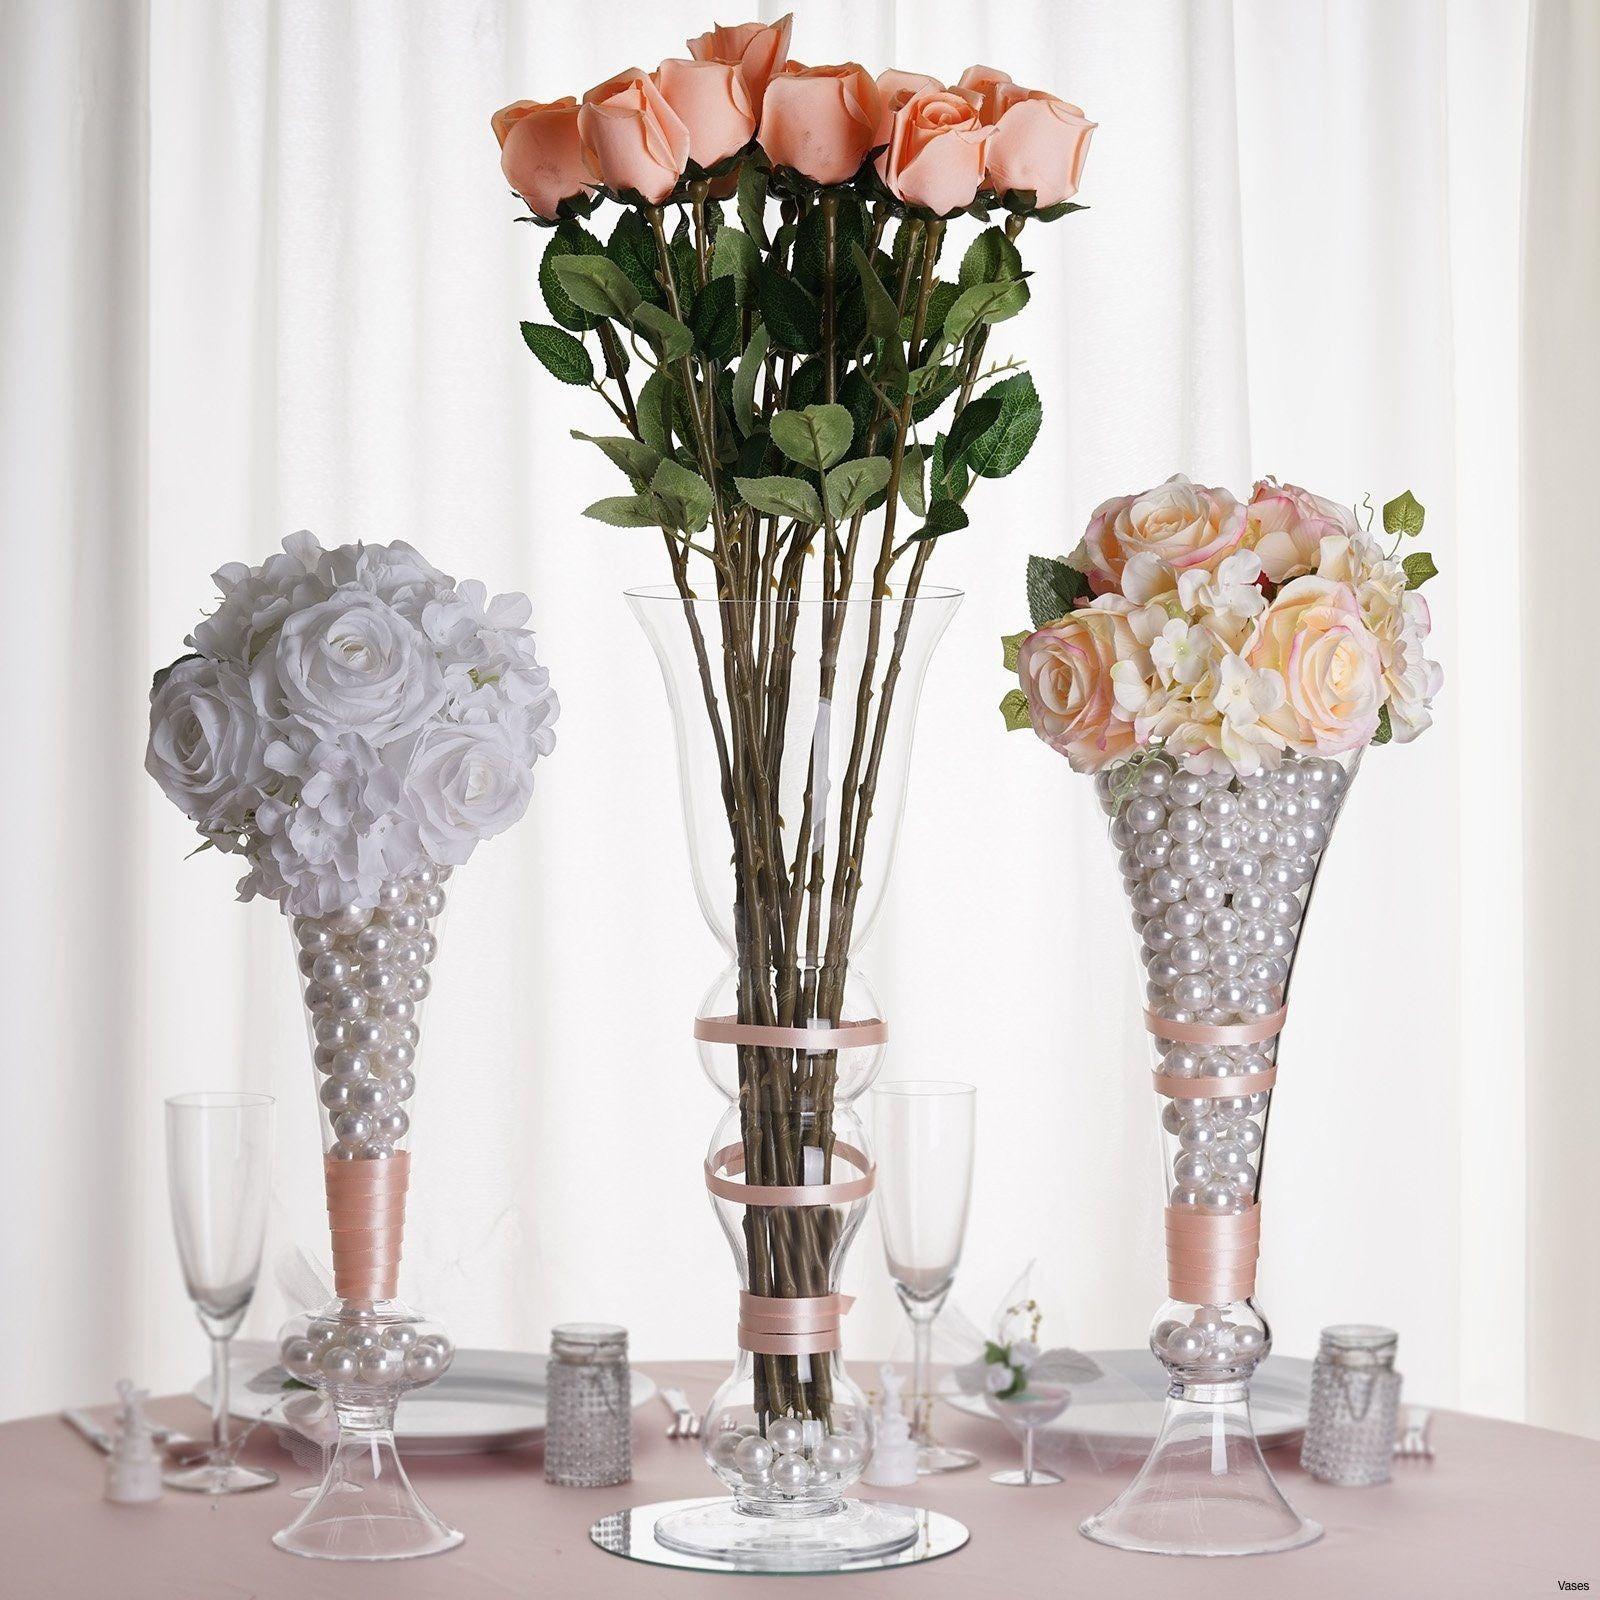 glass vase for fish of blue and white vase luxury flower clipart beautiful flower vase pertaining to blue and white vase luxury flower clipart beautiful flower vase table 04h vases tablei